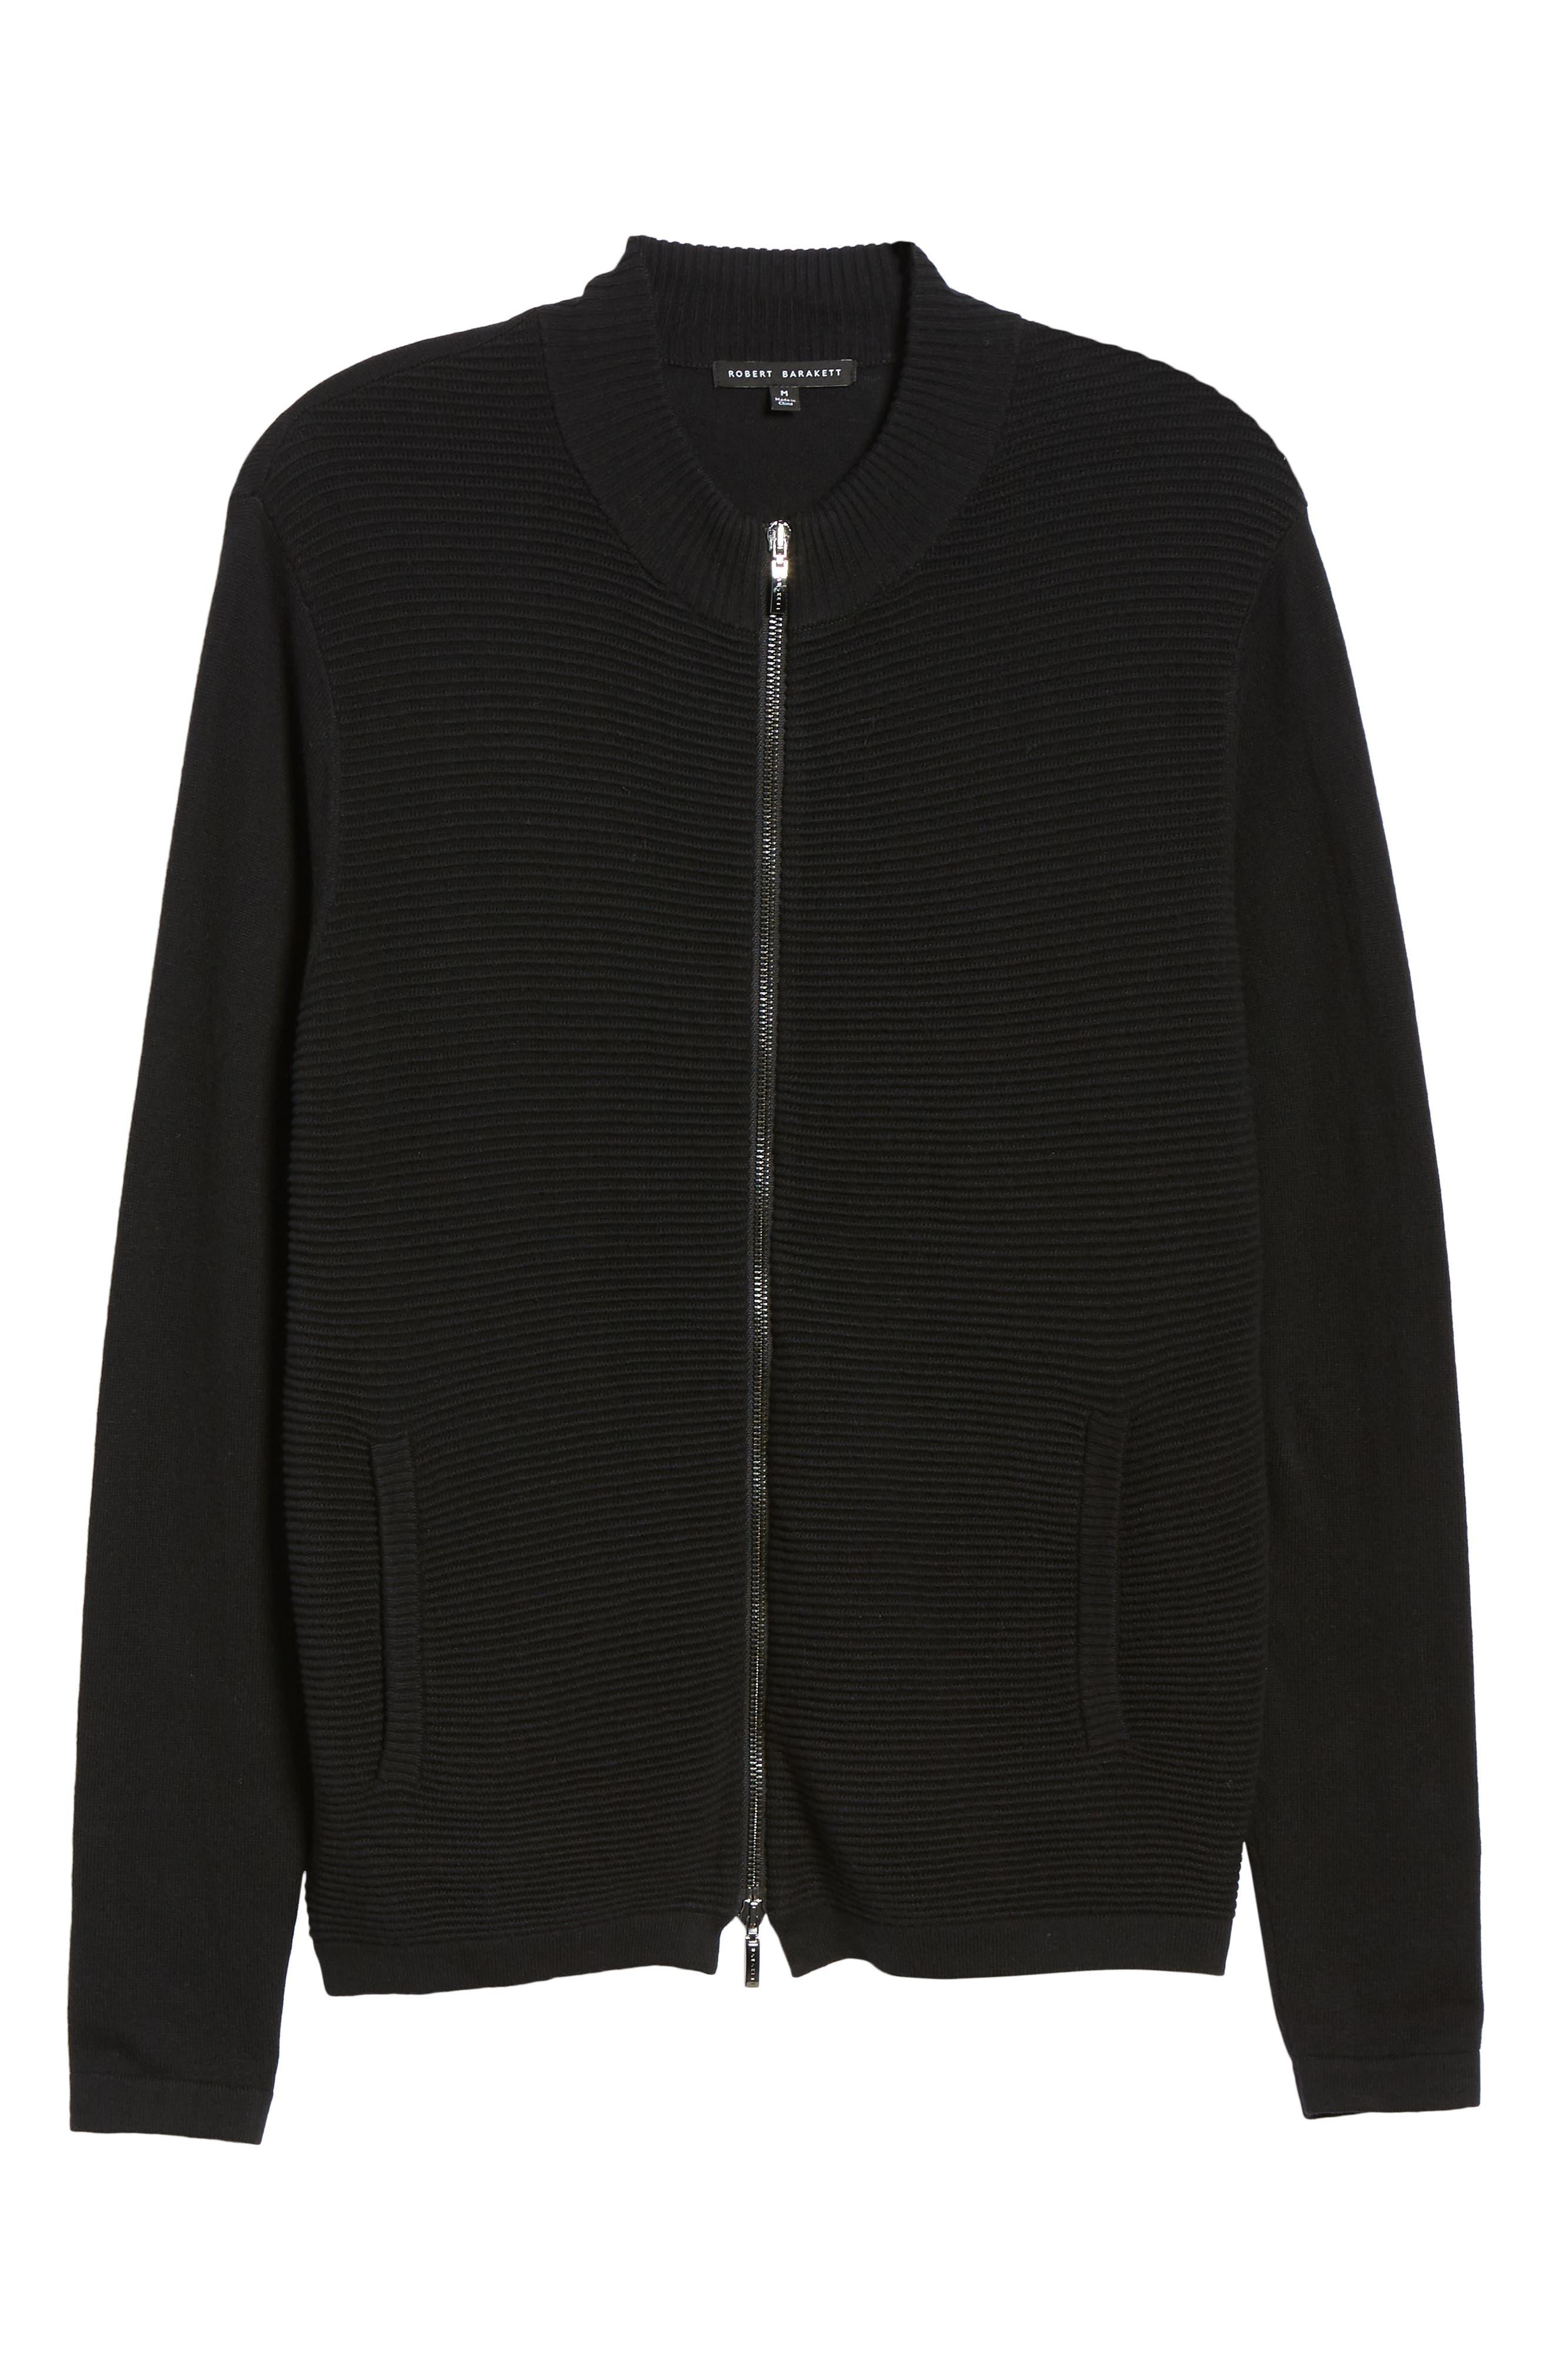 Yorkville Zip Sweater,                             Alternate thumbnail 6, color,                             BLACK